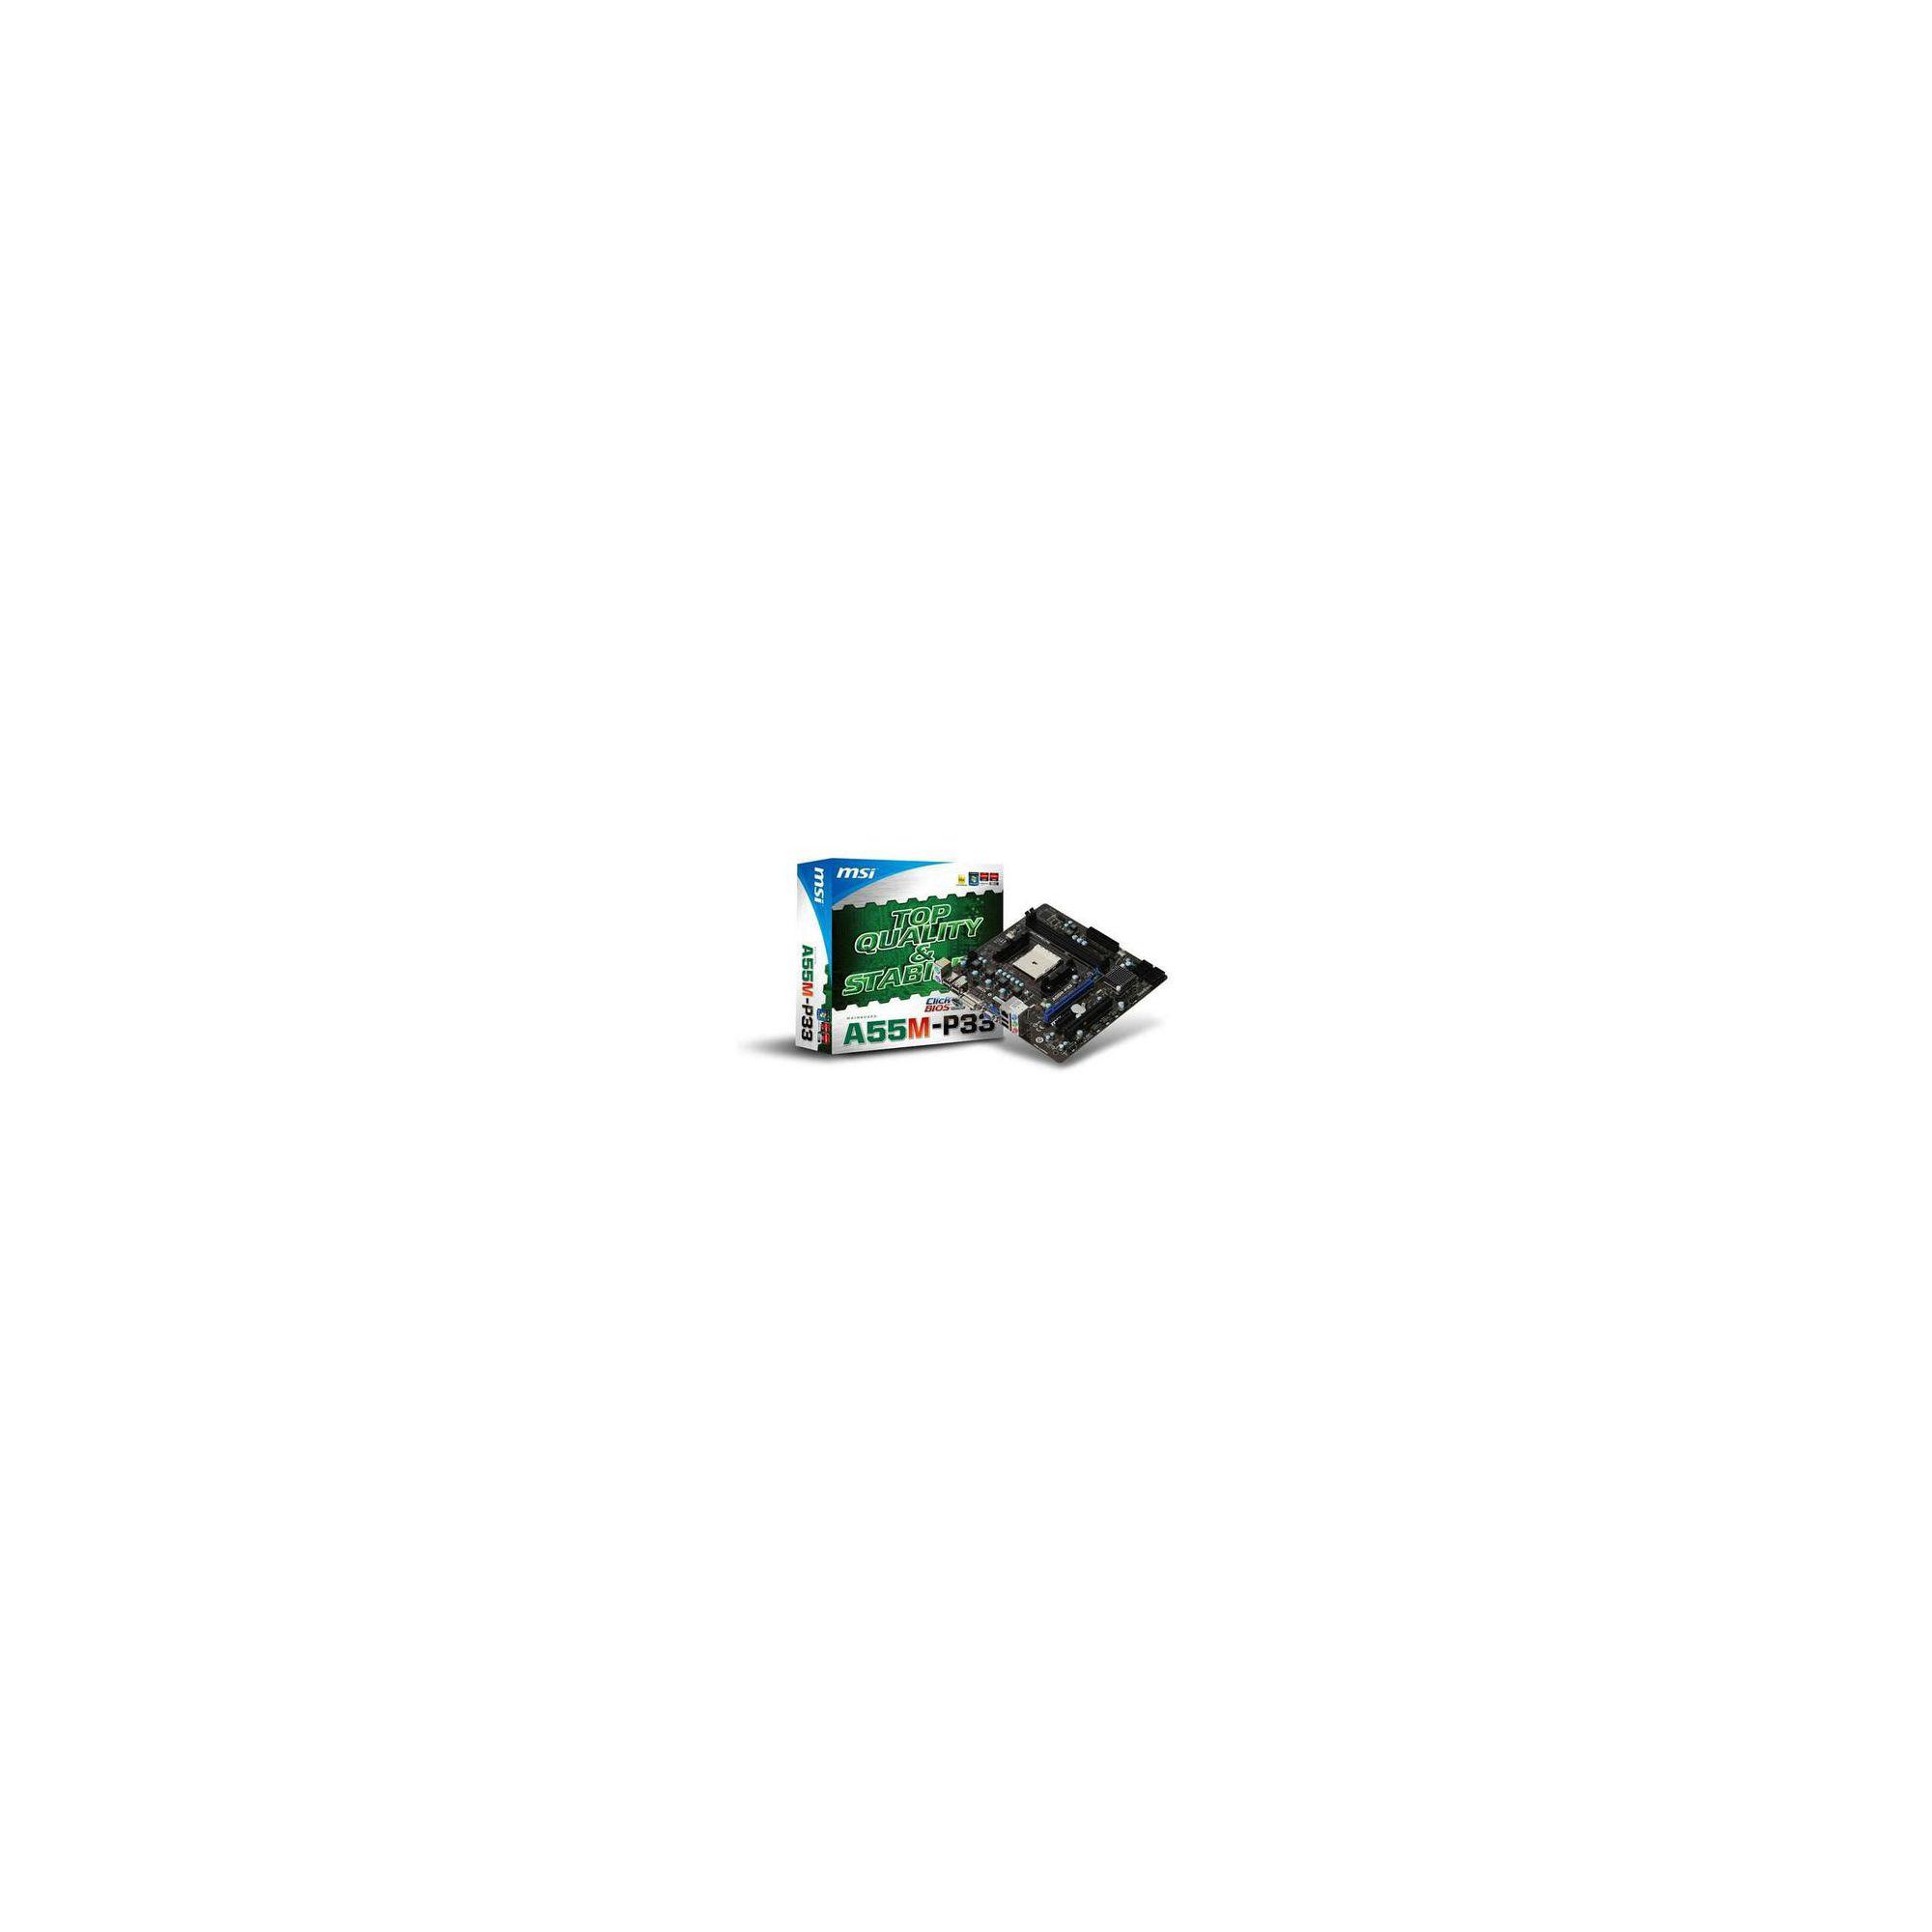 msi-a55-m-p33-motherboard-amd-a55-micro-atx-raid-gigabit-lan